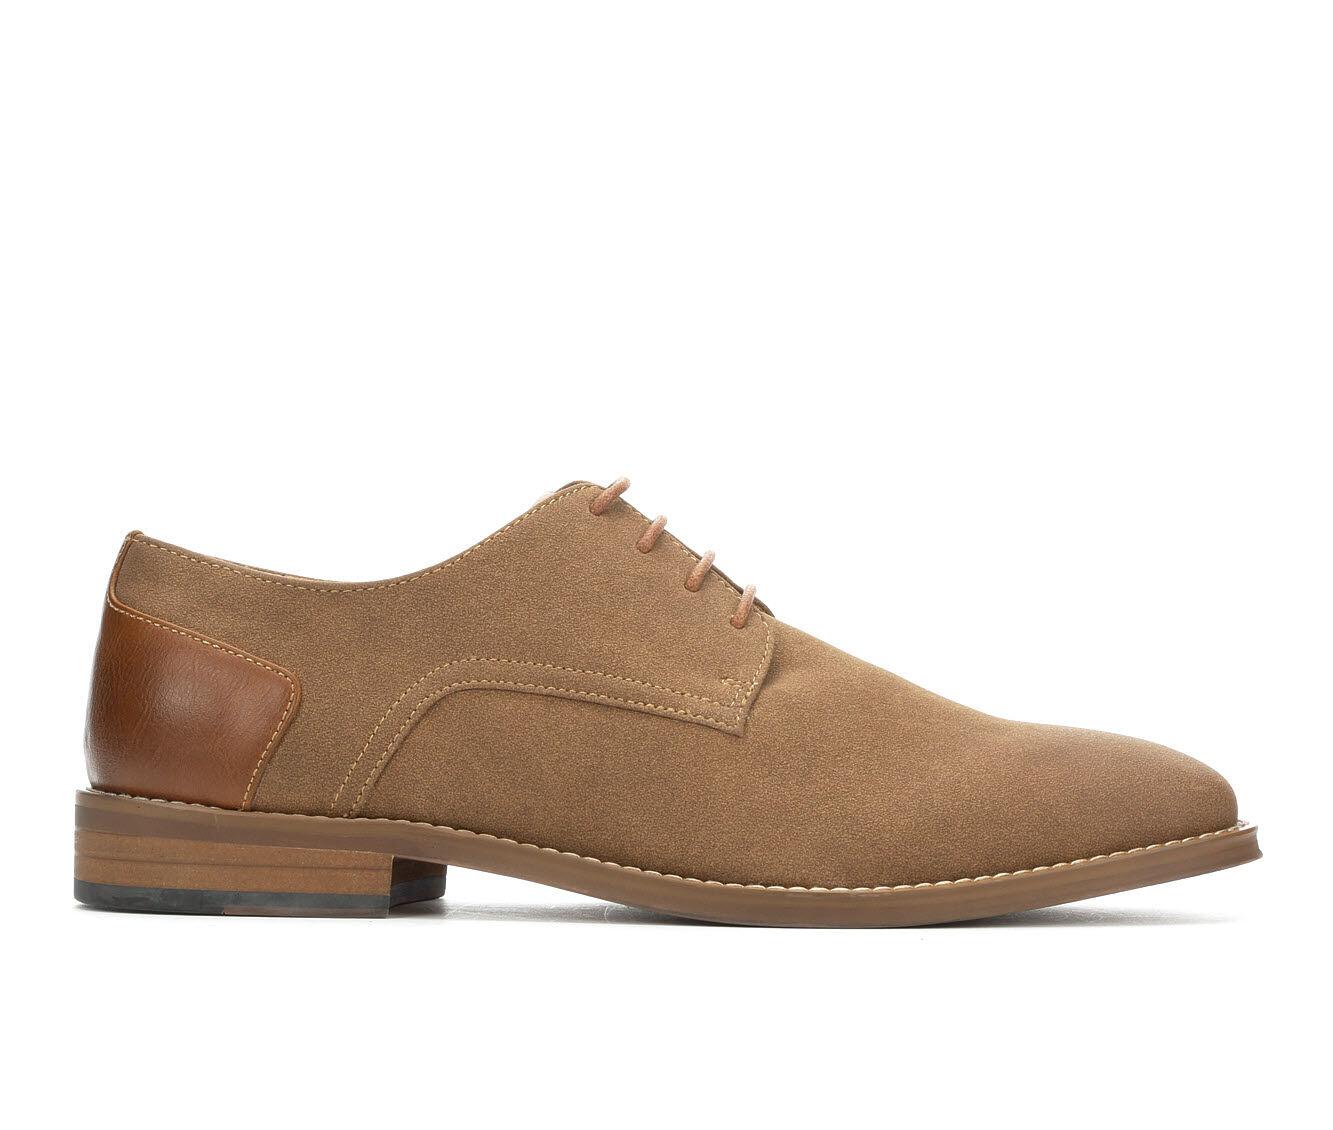 uk shoes_kd1313